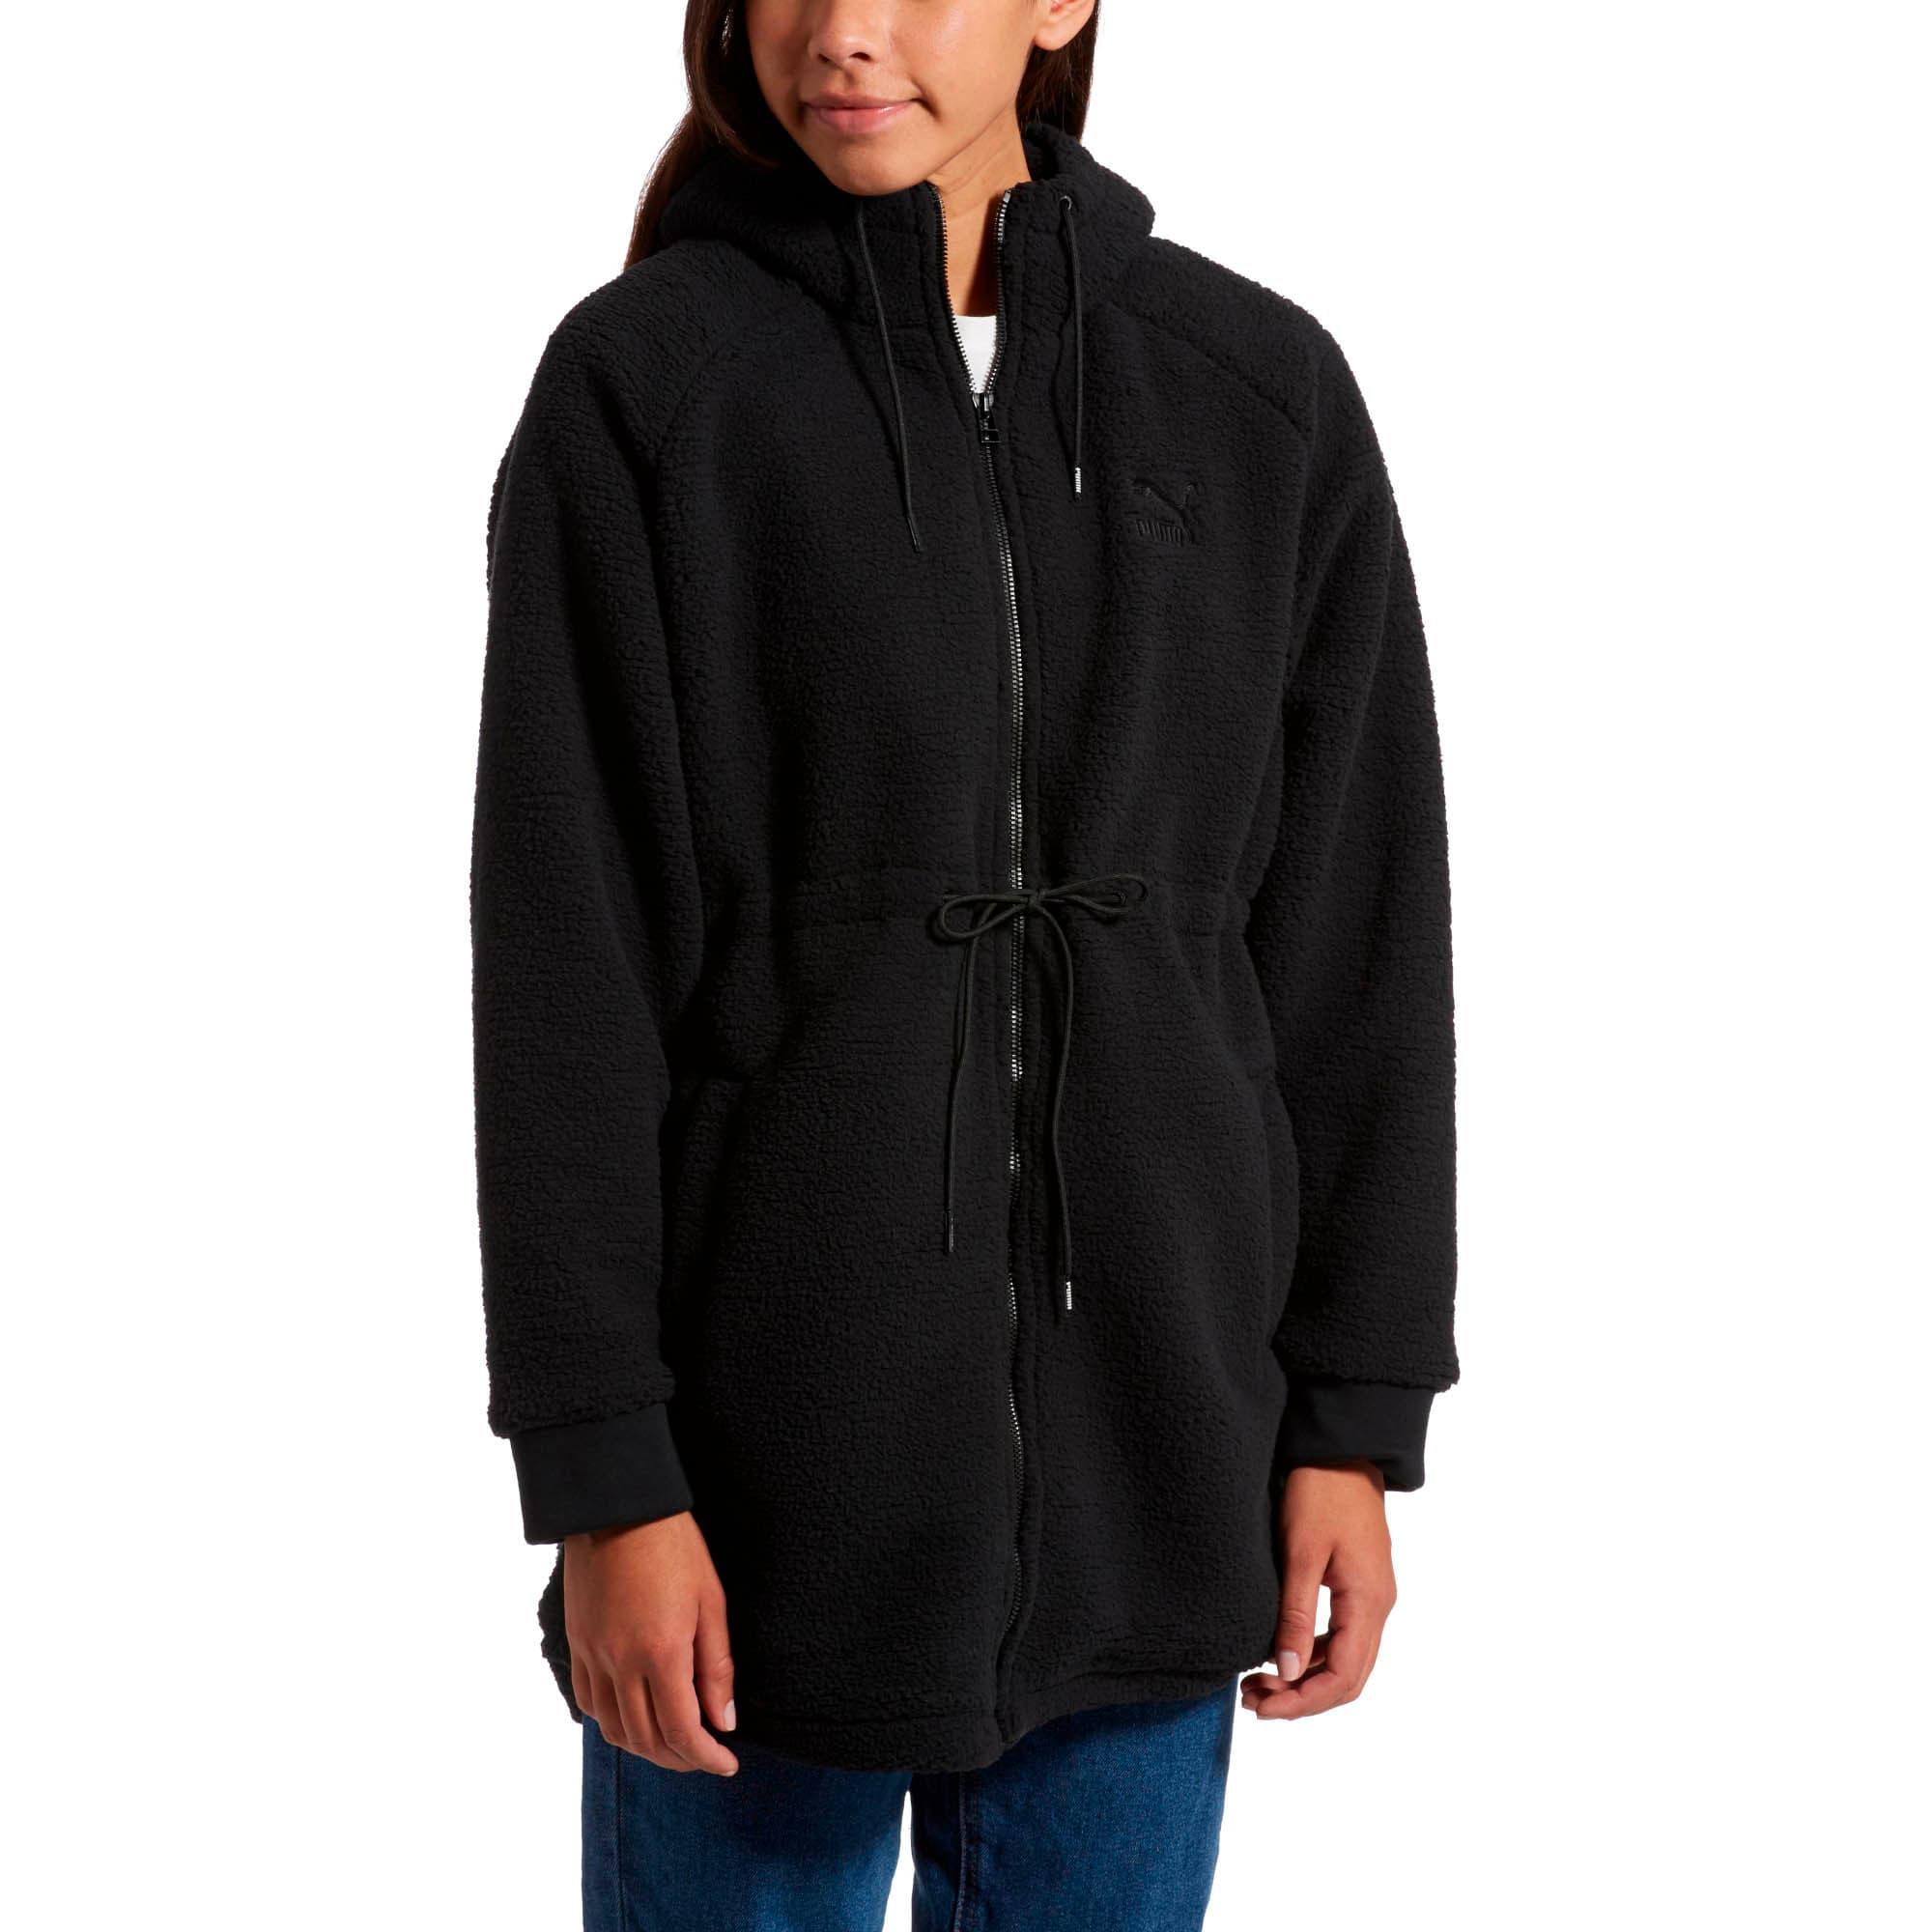 Thumbnail 2 of Downtown Winterised Full Zip Women's Sherpa Hoodie, Puma Black, medium